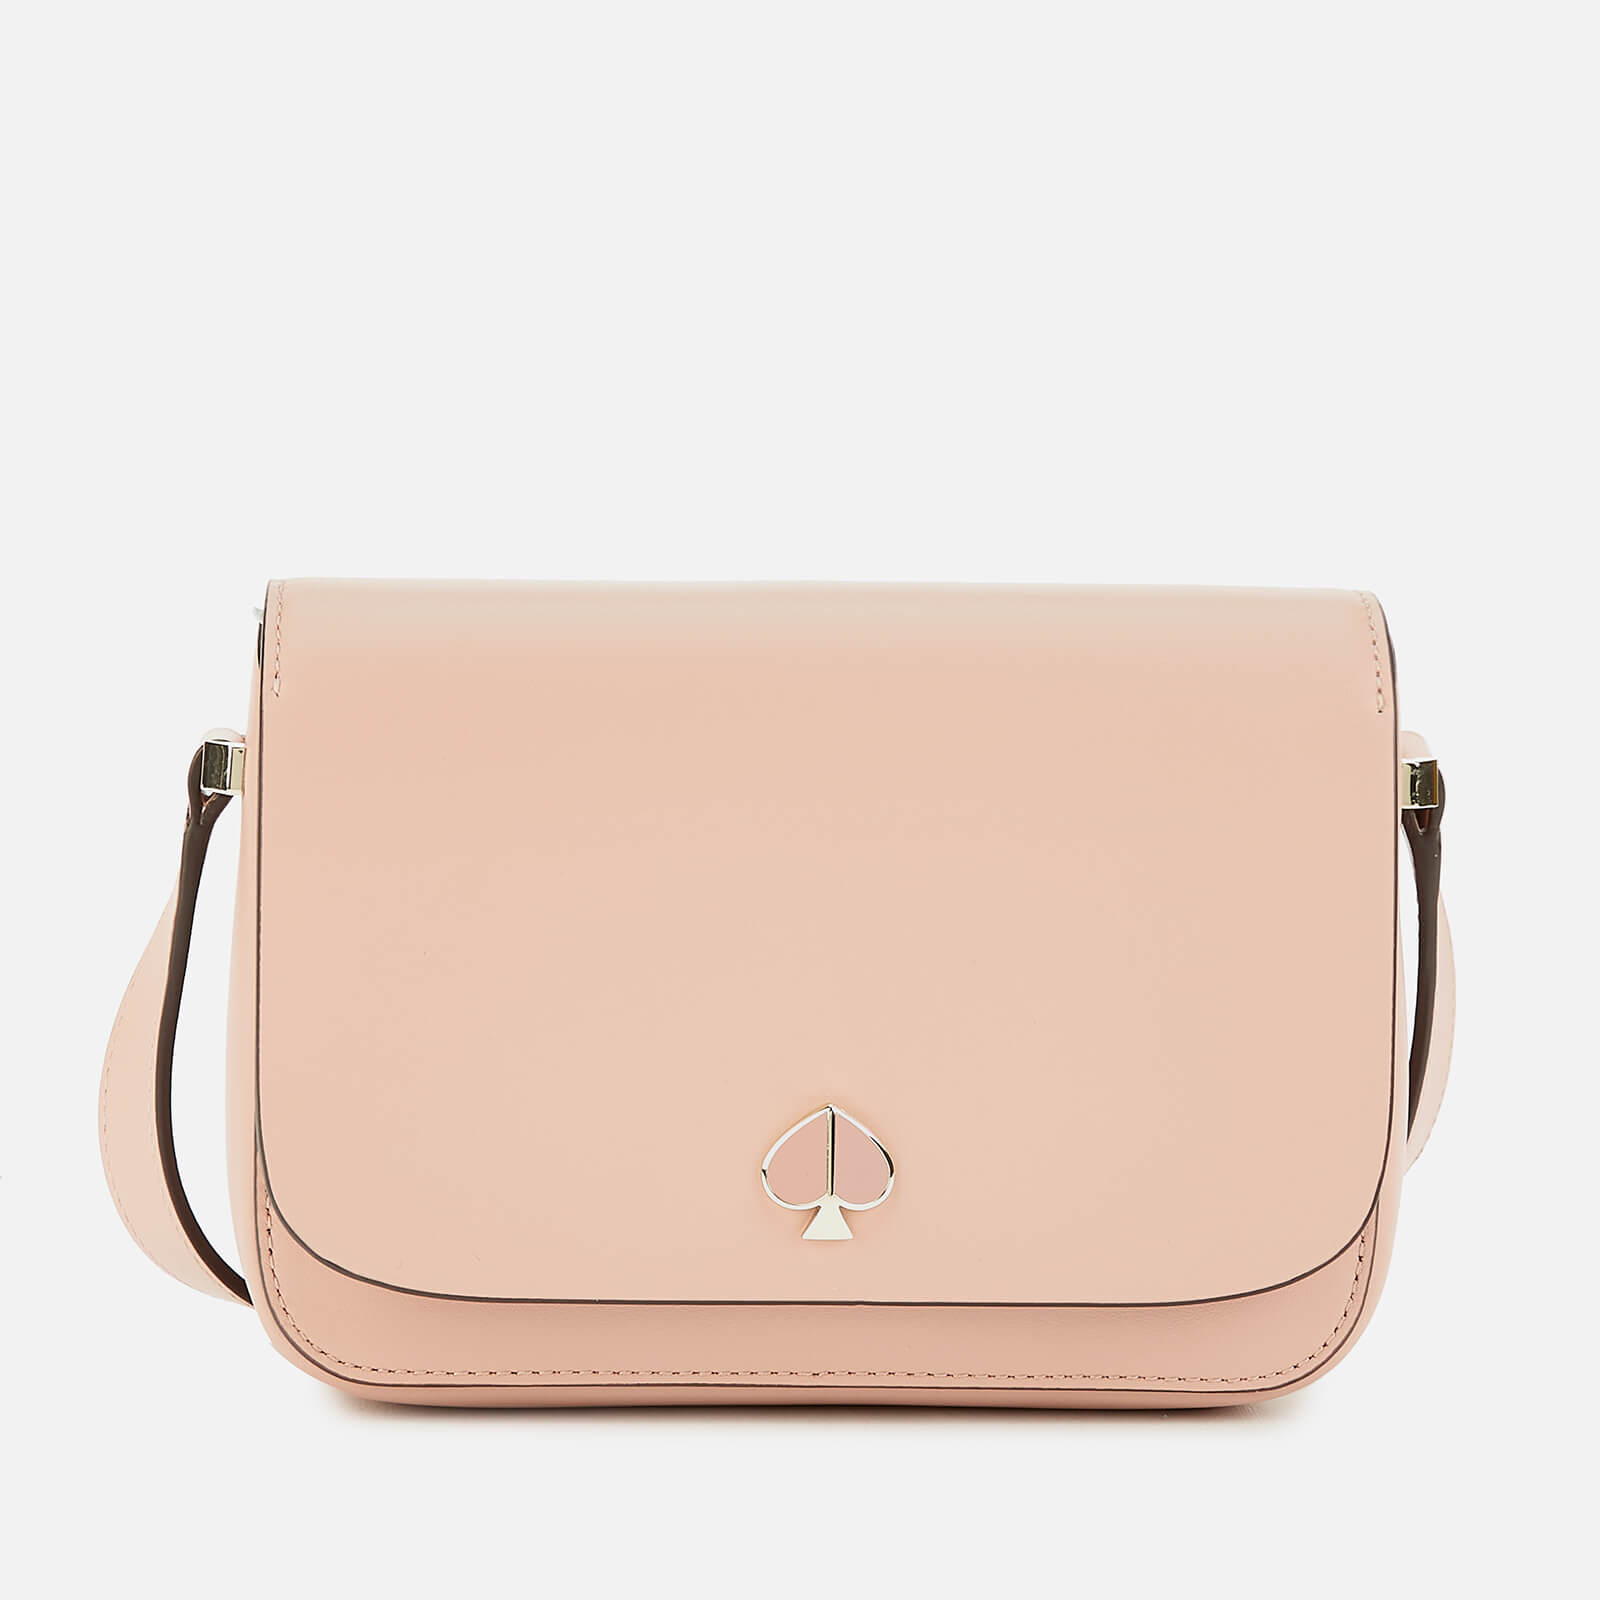 Kate Spade New York Women S Nicola Small Flap Shoulder Bag Fler Pink